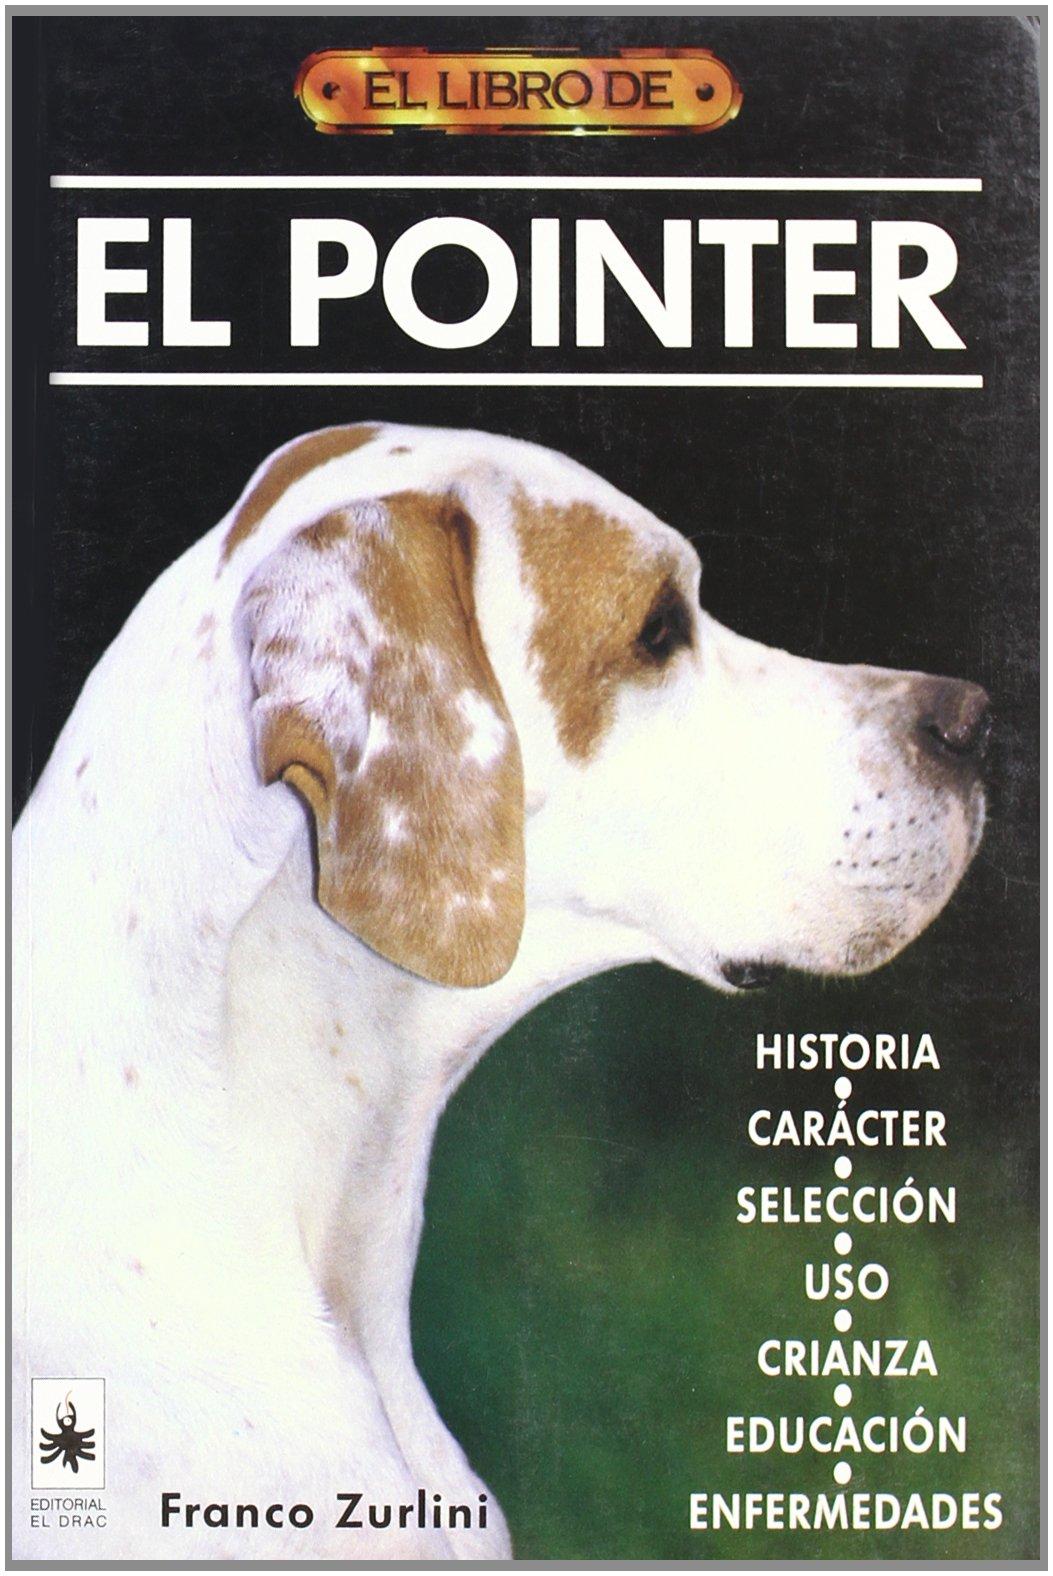 El Pointer (Spanish Edition) (Spanish) Paperback – December, 1997